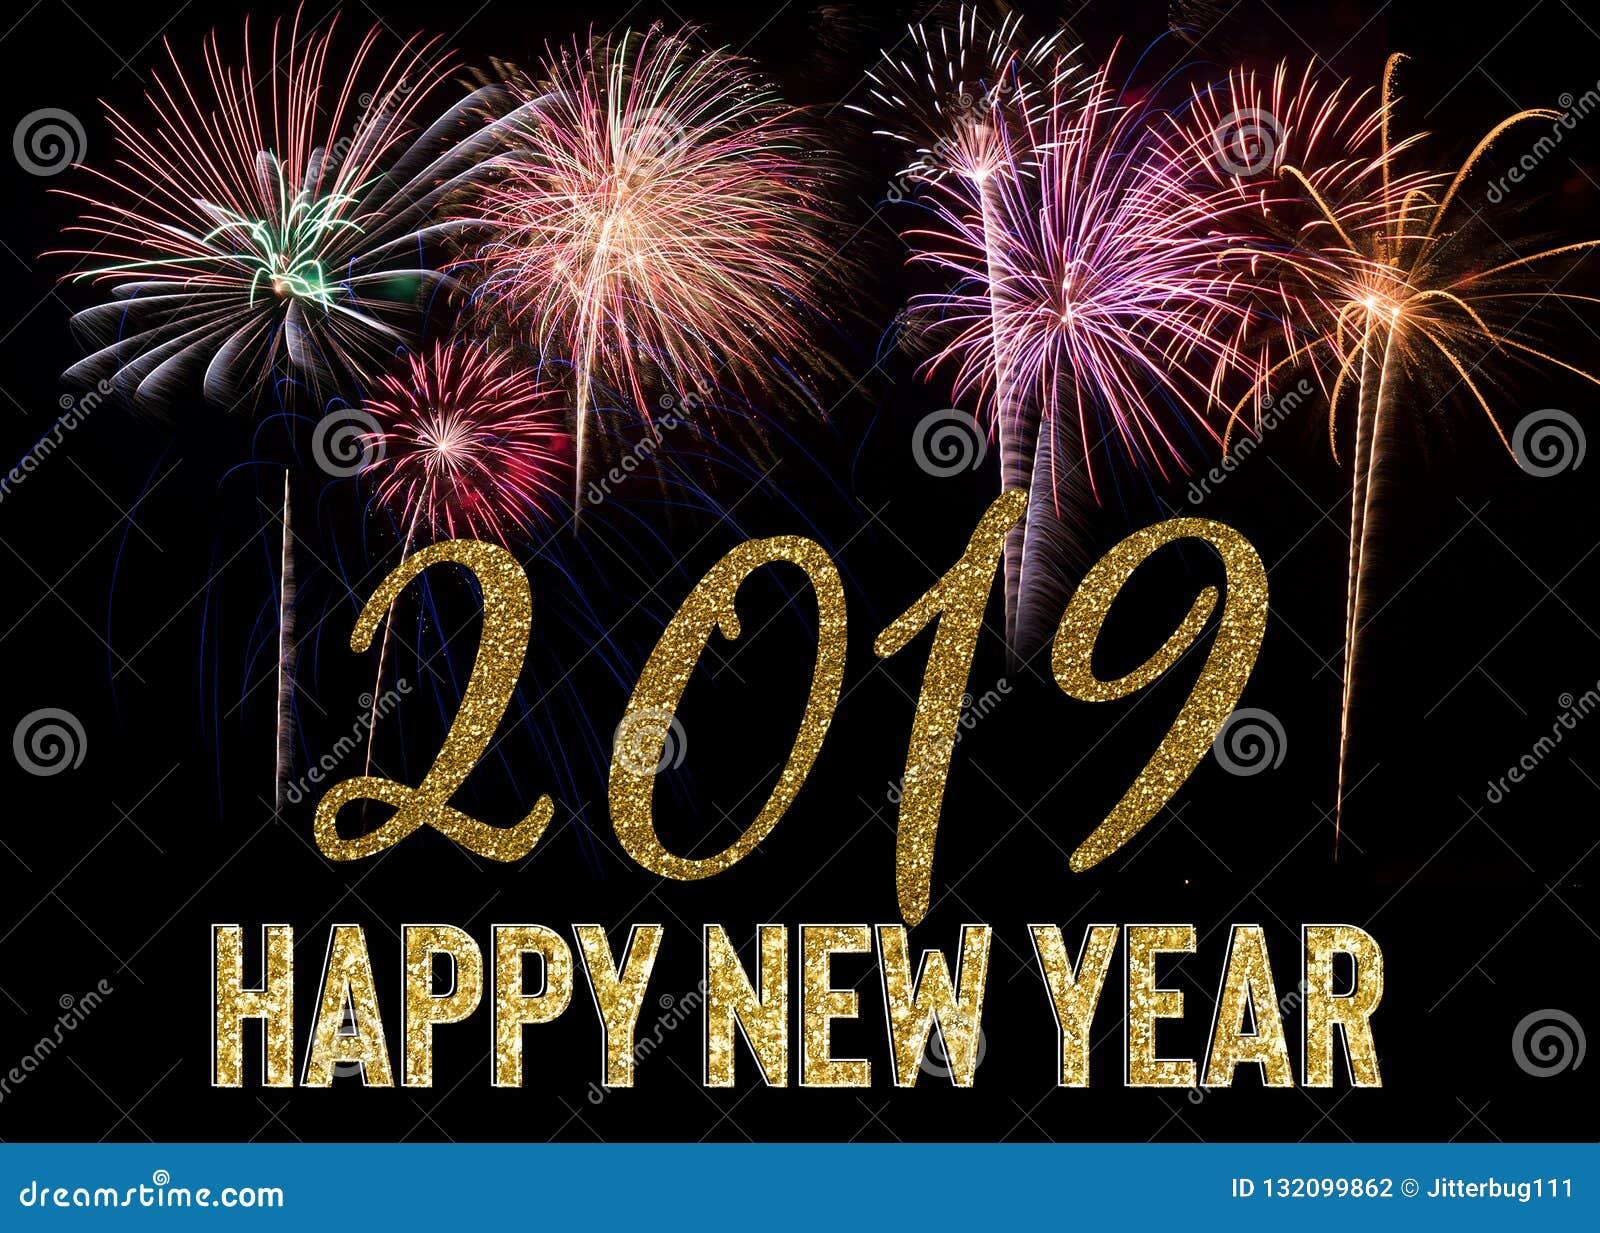 Guten Rutsch Karten T Happy New Year New Years Eve